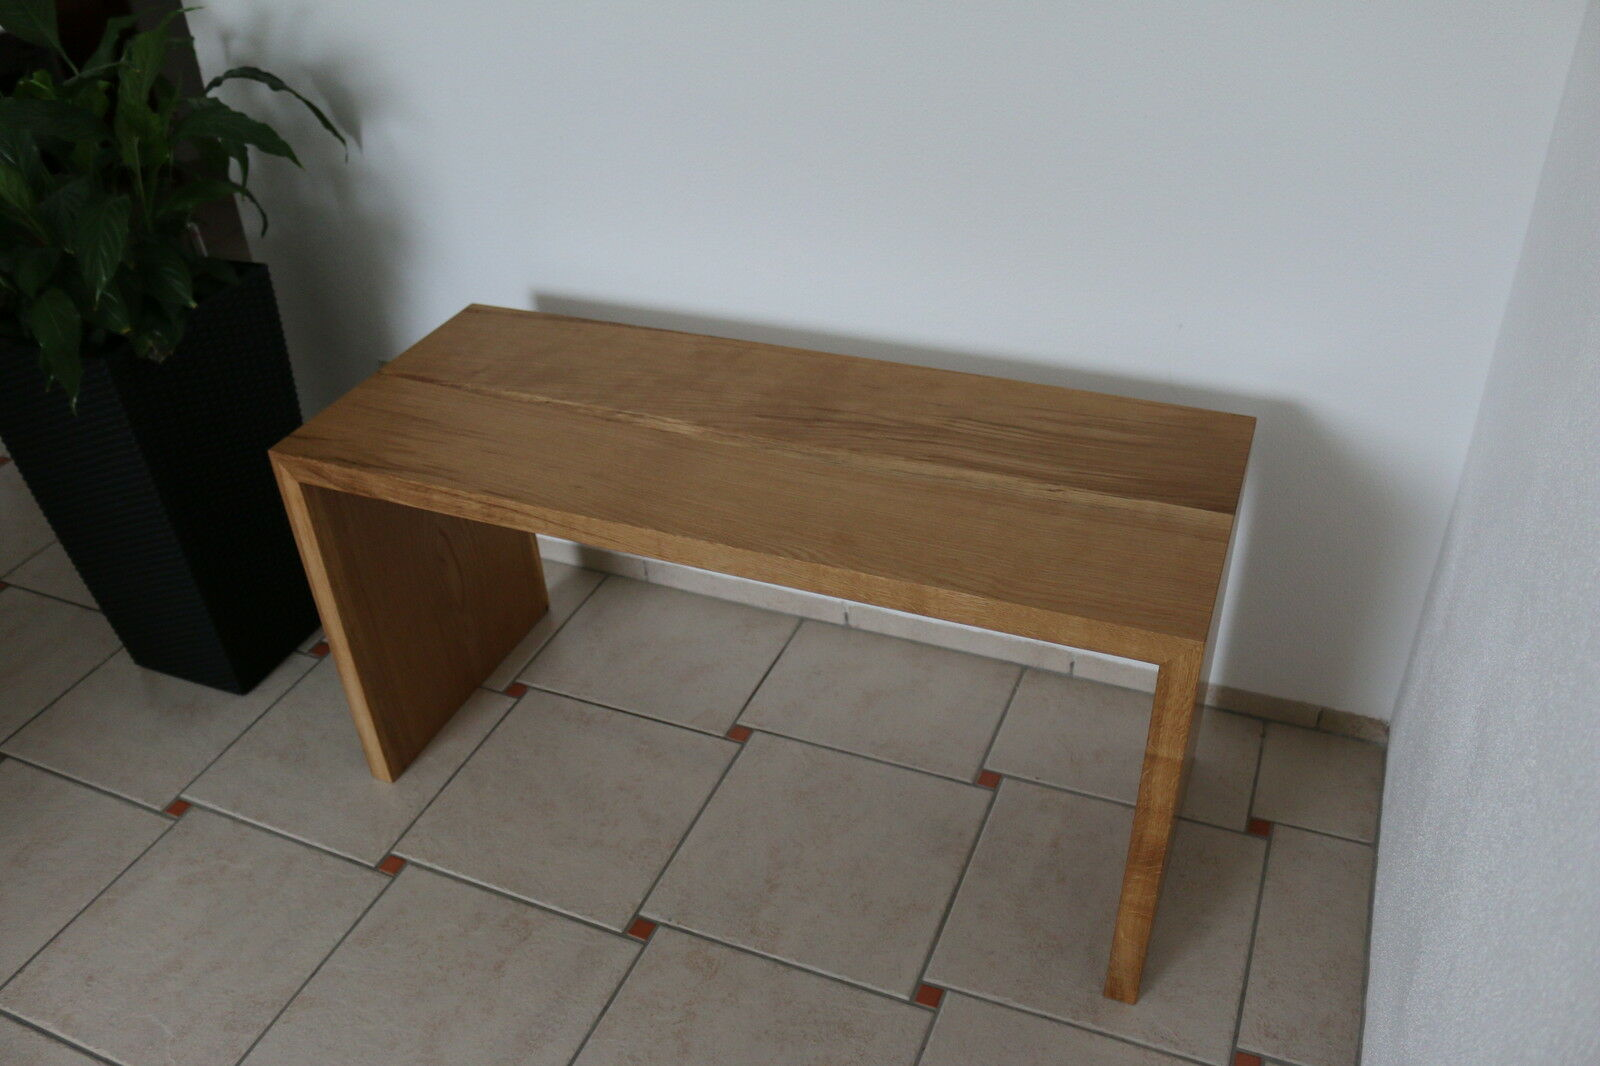 designer hocker aus eiche massiv holz sitzhocker neu stuhl sitzbank au auf ma eur 310 00. Black Bedroom Furniture Sets. Home Design Ideas